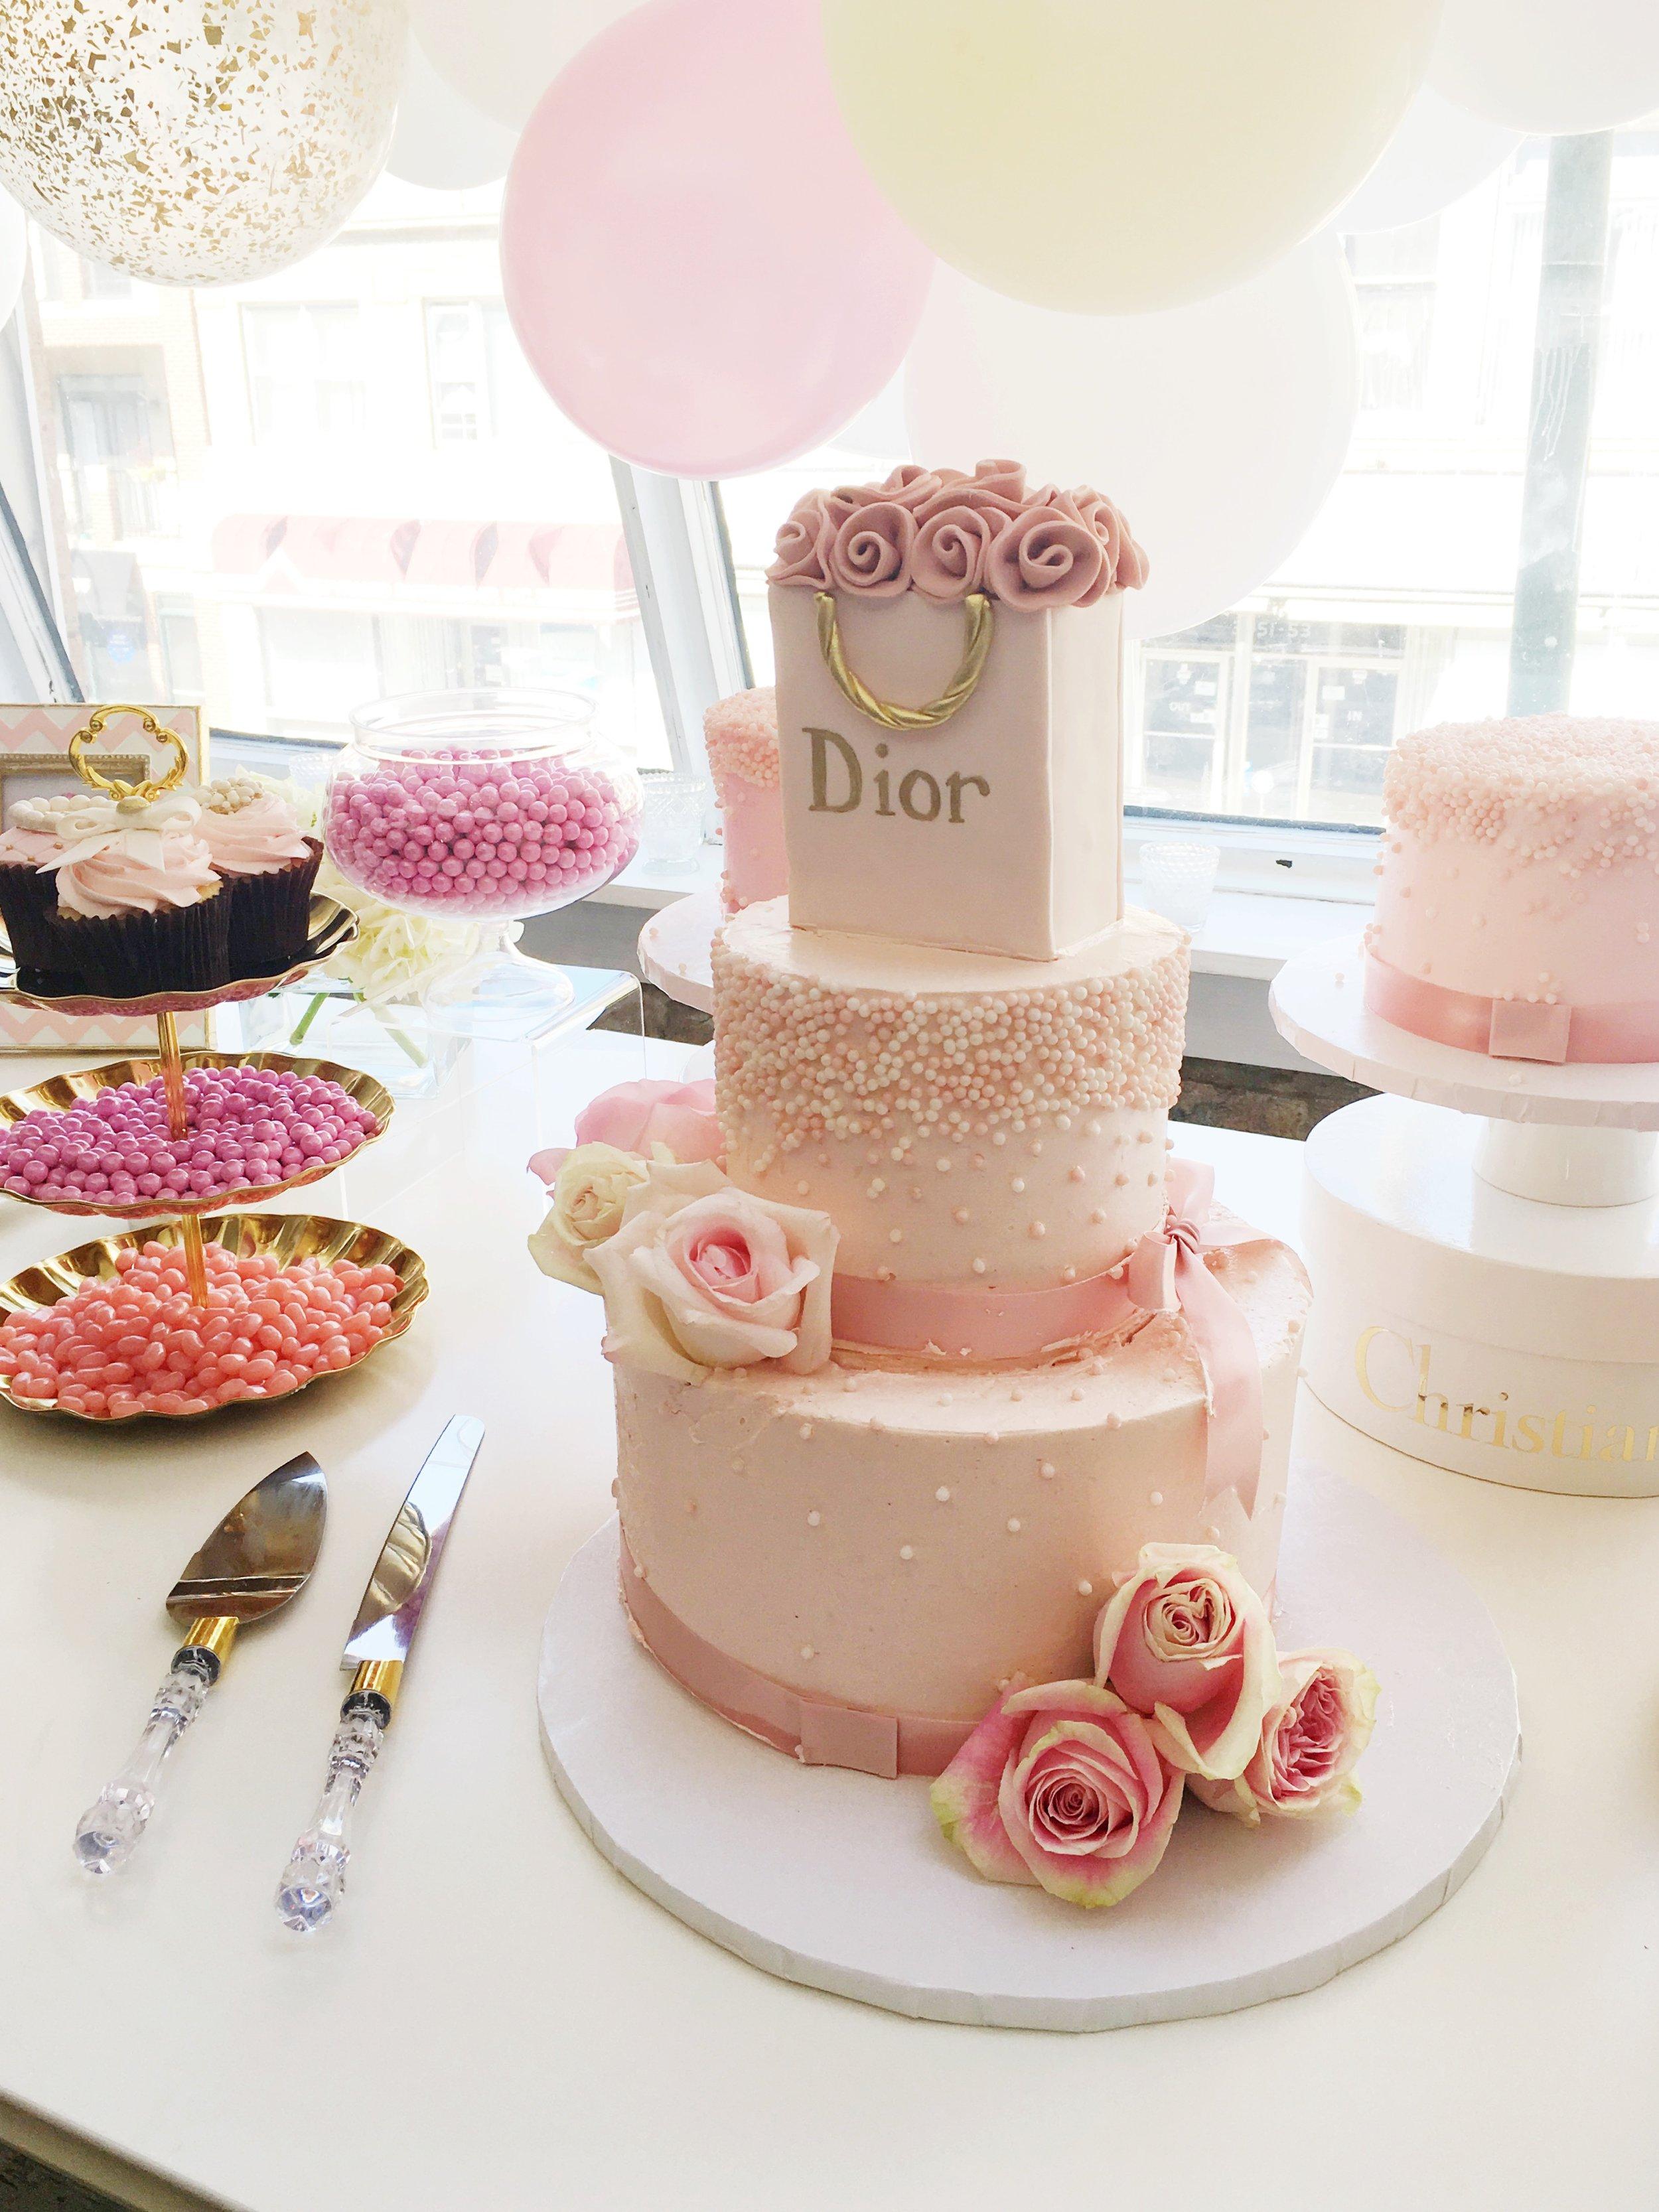 Baby Dior 1st Birthday